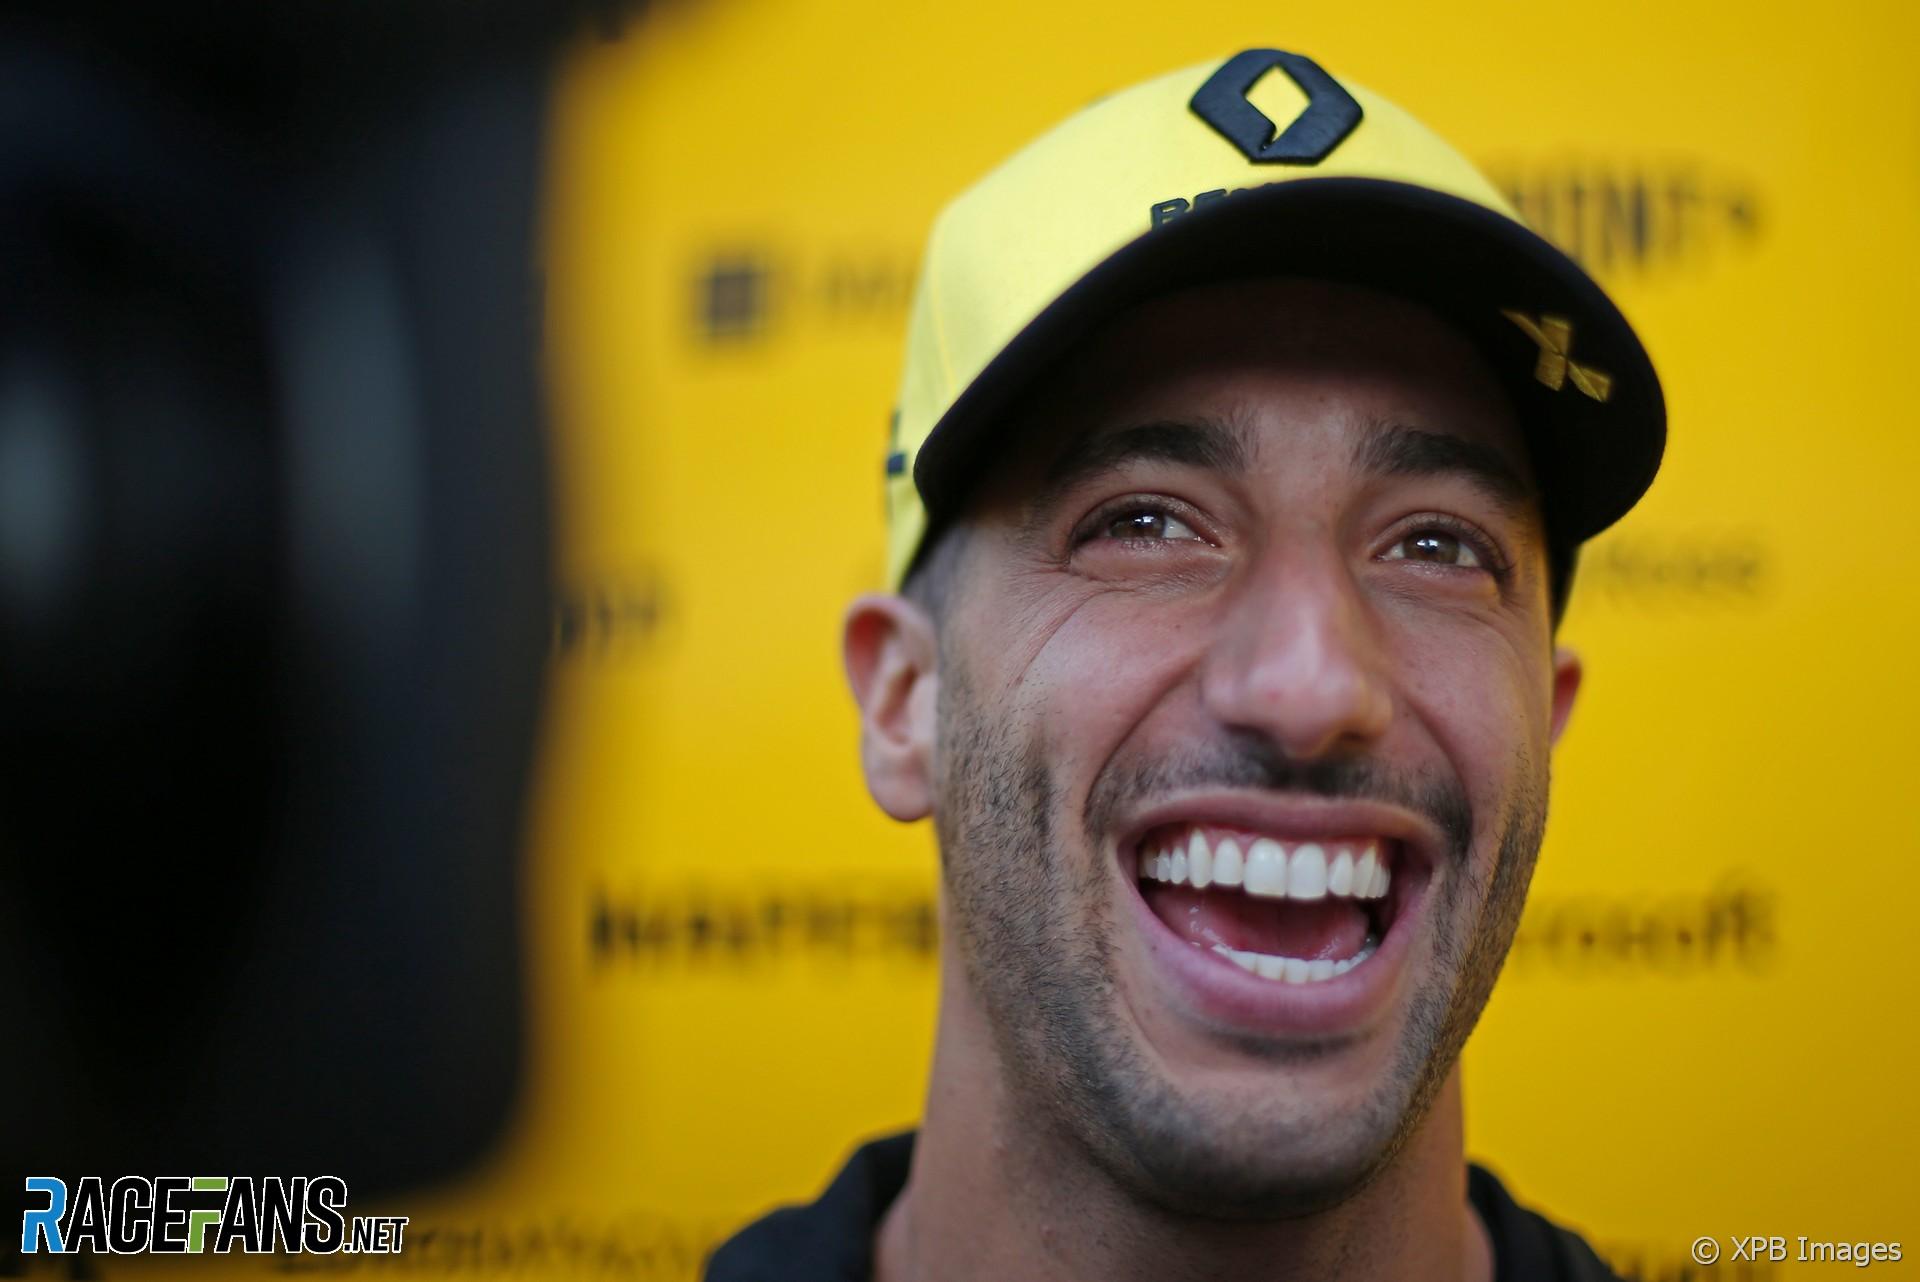 Daniel Ricciardo F1 Driver Biography Formula One Racefans